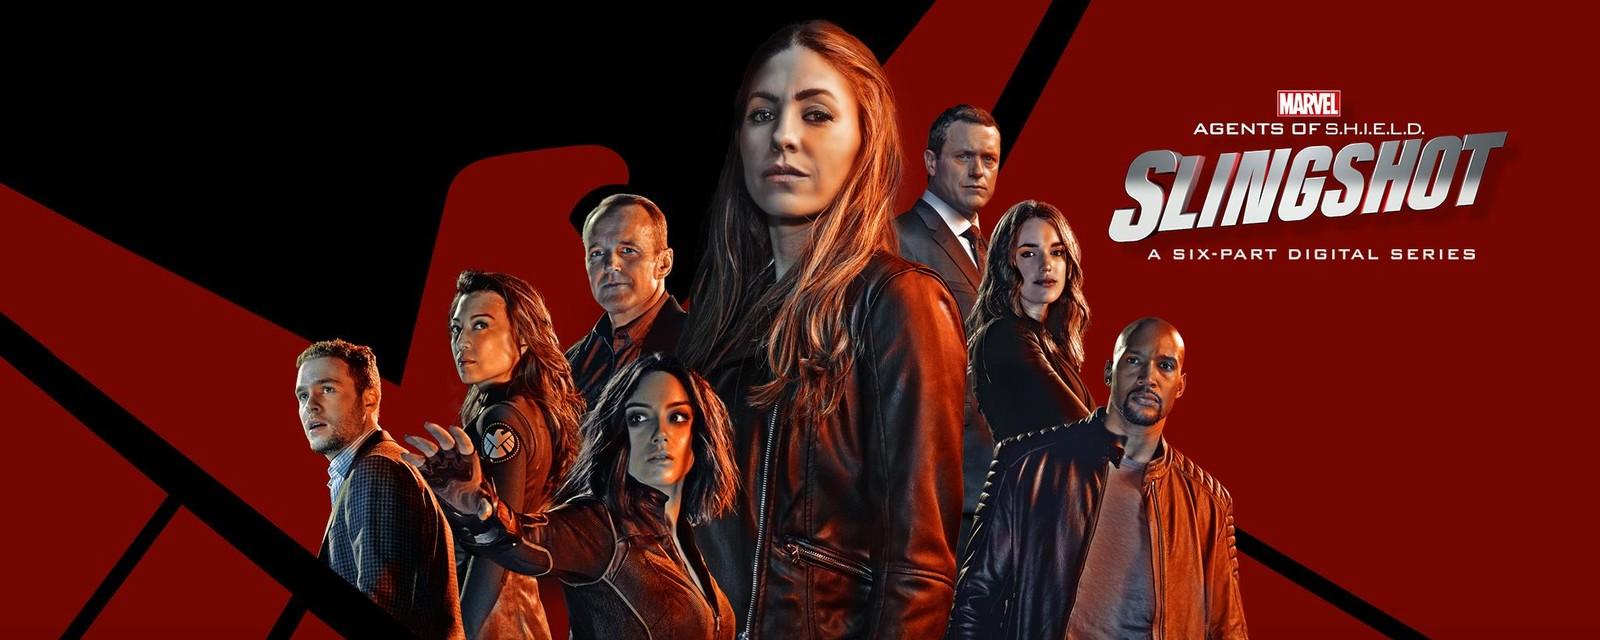 "Websérie ""Agents of S.H.I.E.L.D.: Slingshot"" disponível no YouTube"